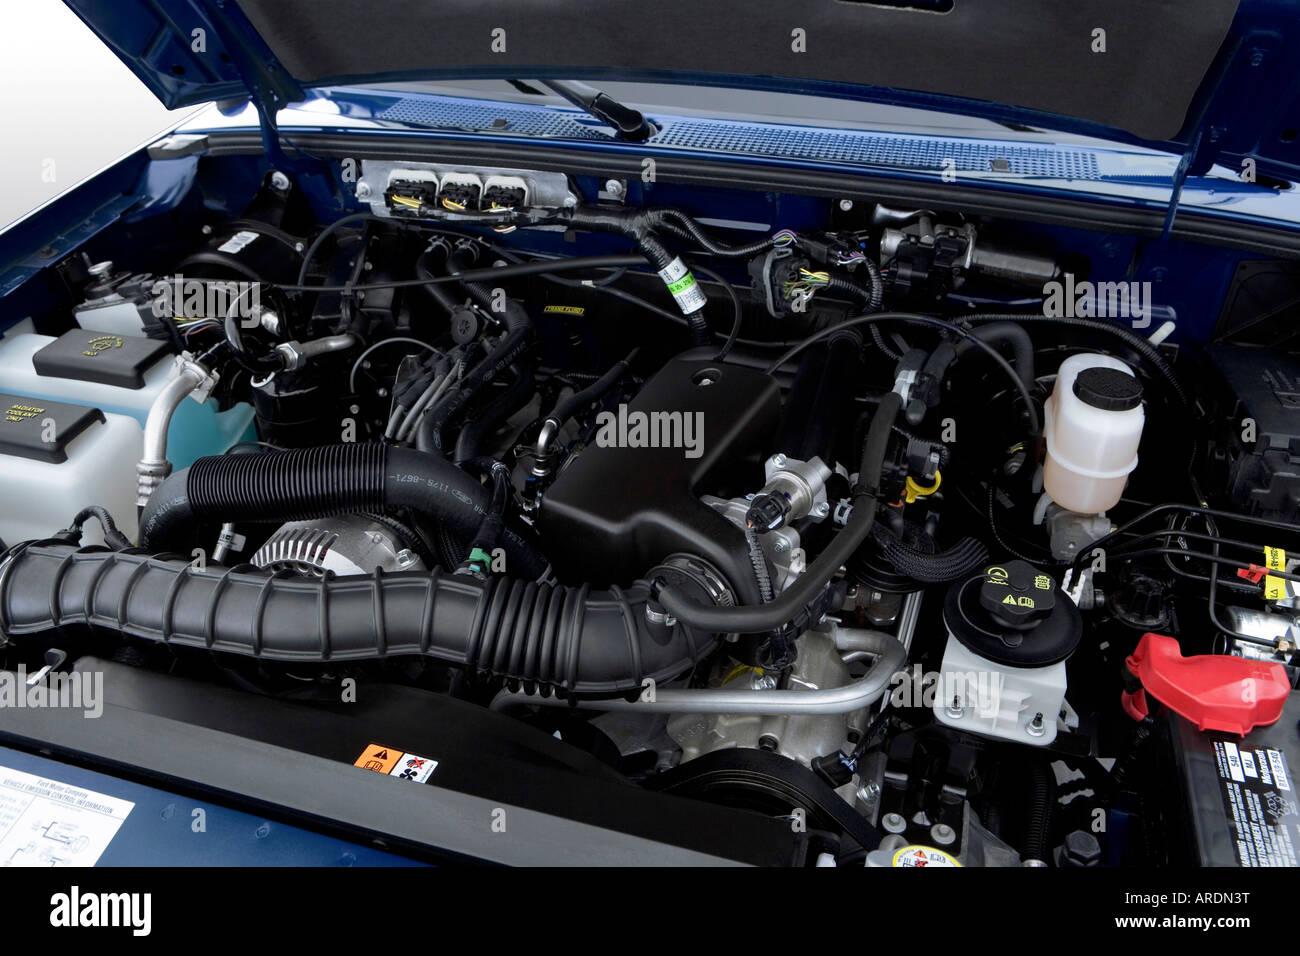 2007 ford ranger xlt in blue engine